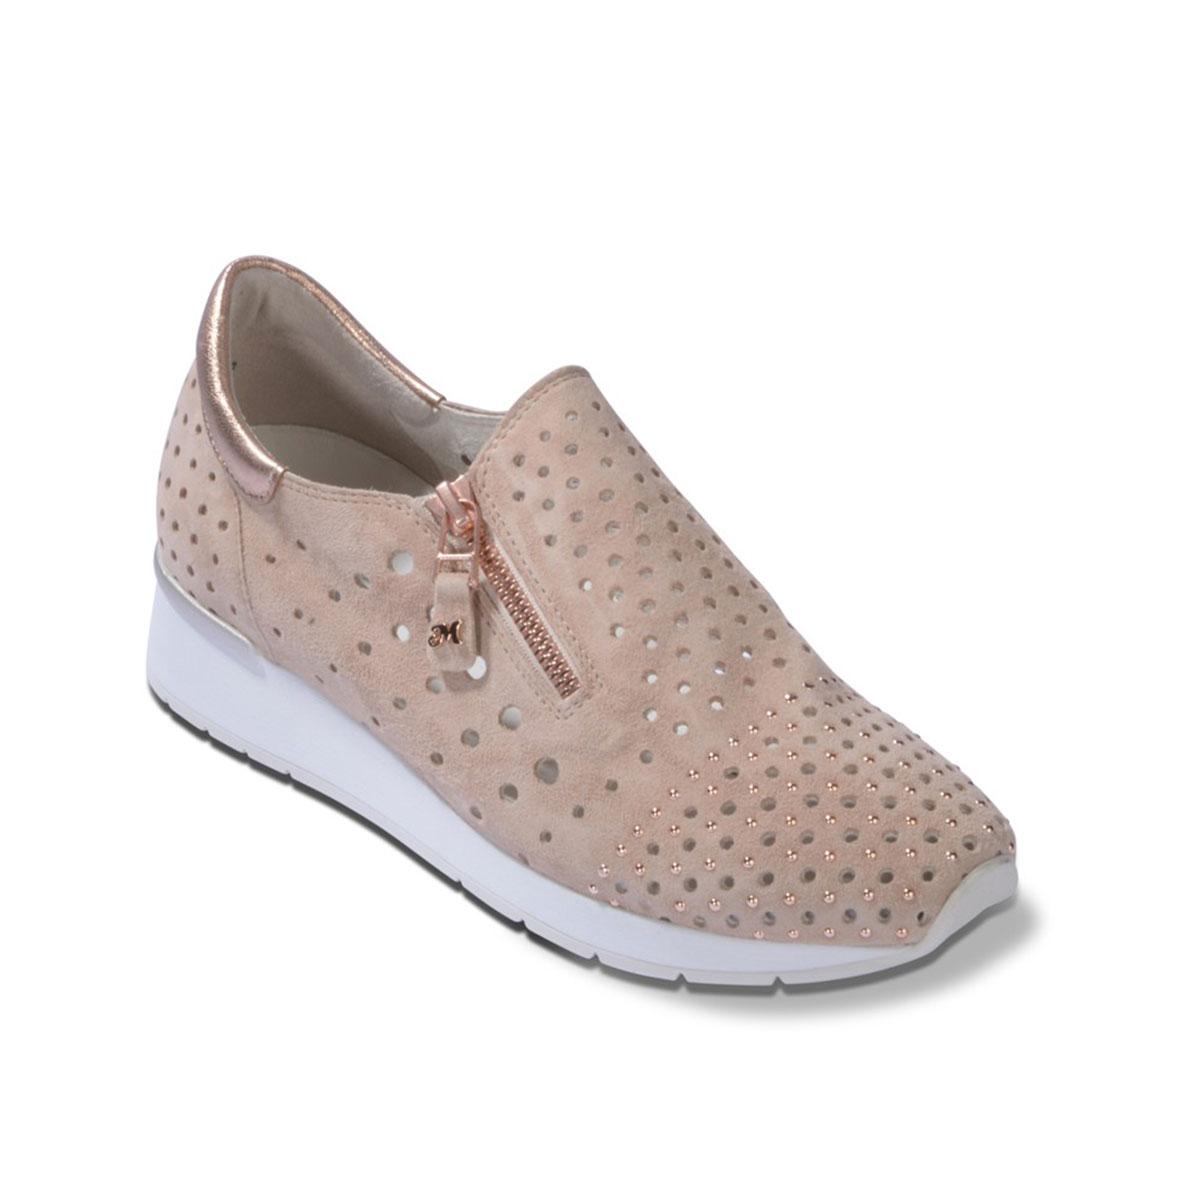 Melluso donna | Grimandi calzature shop